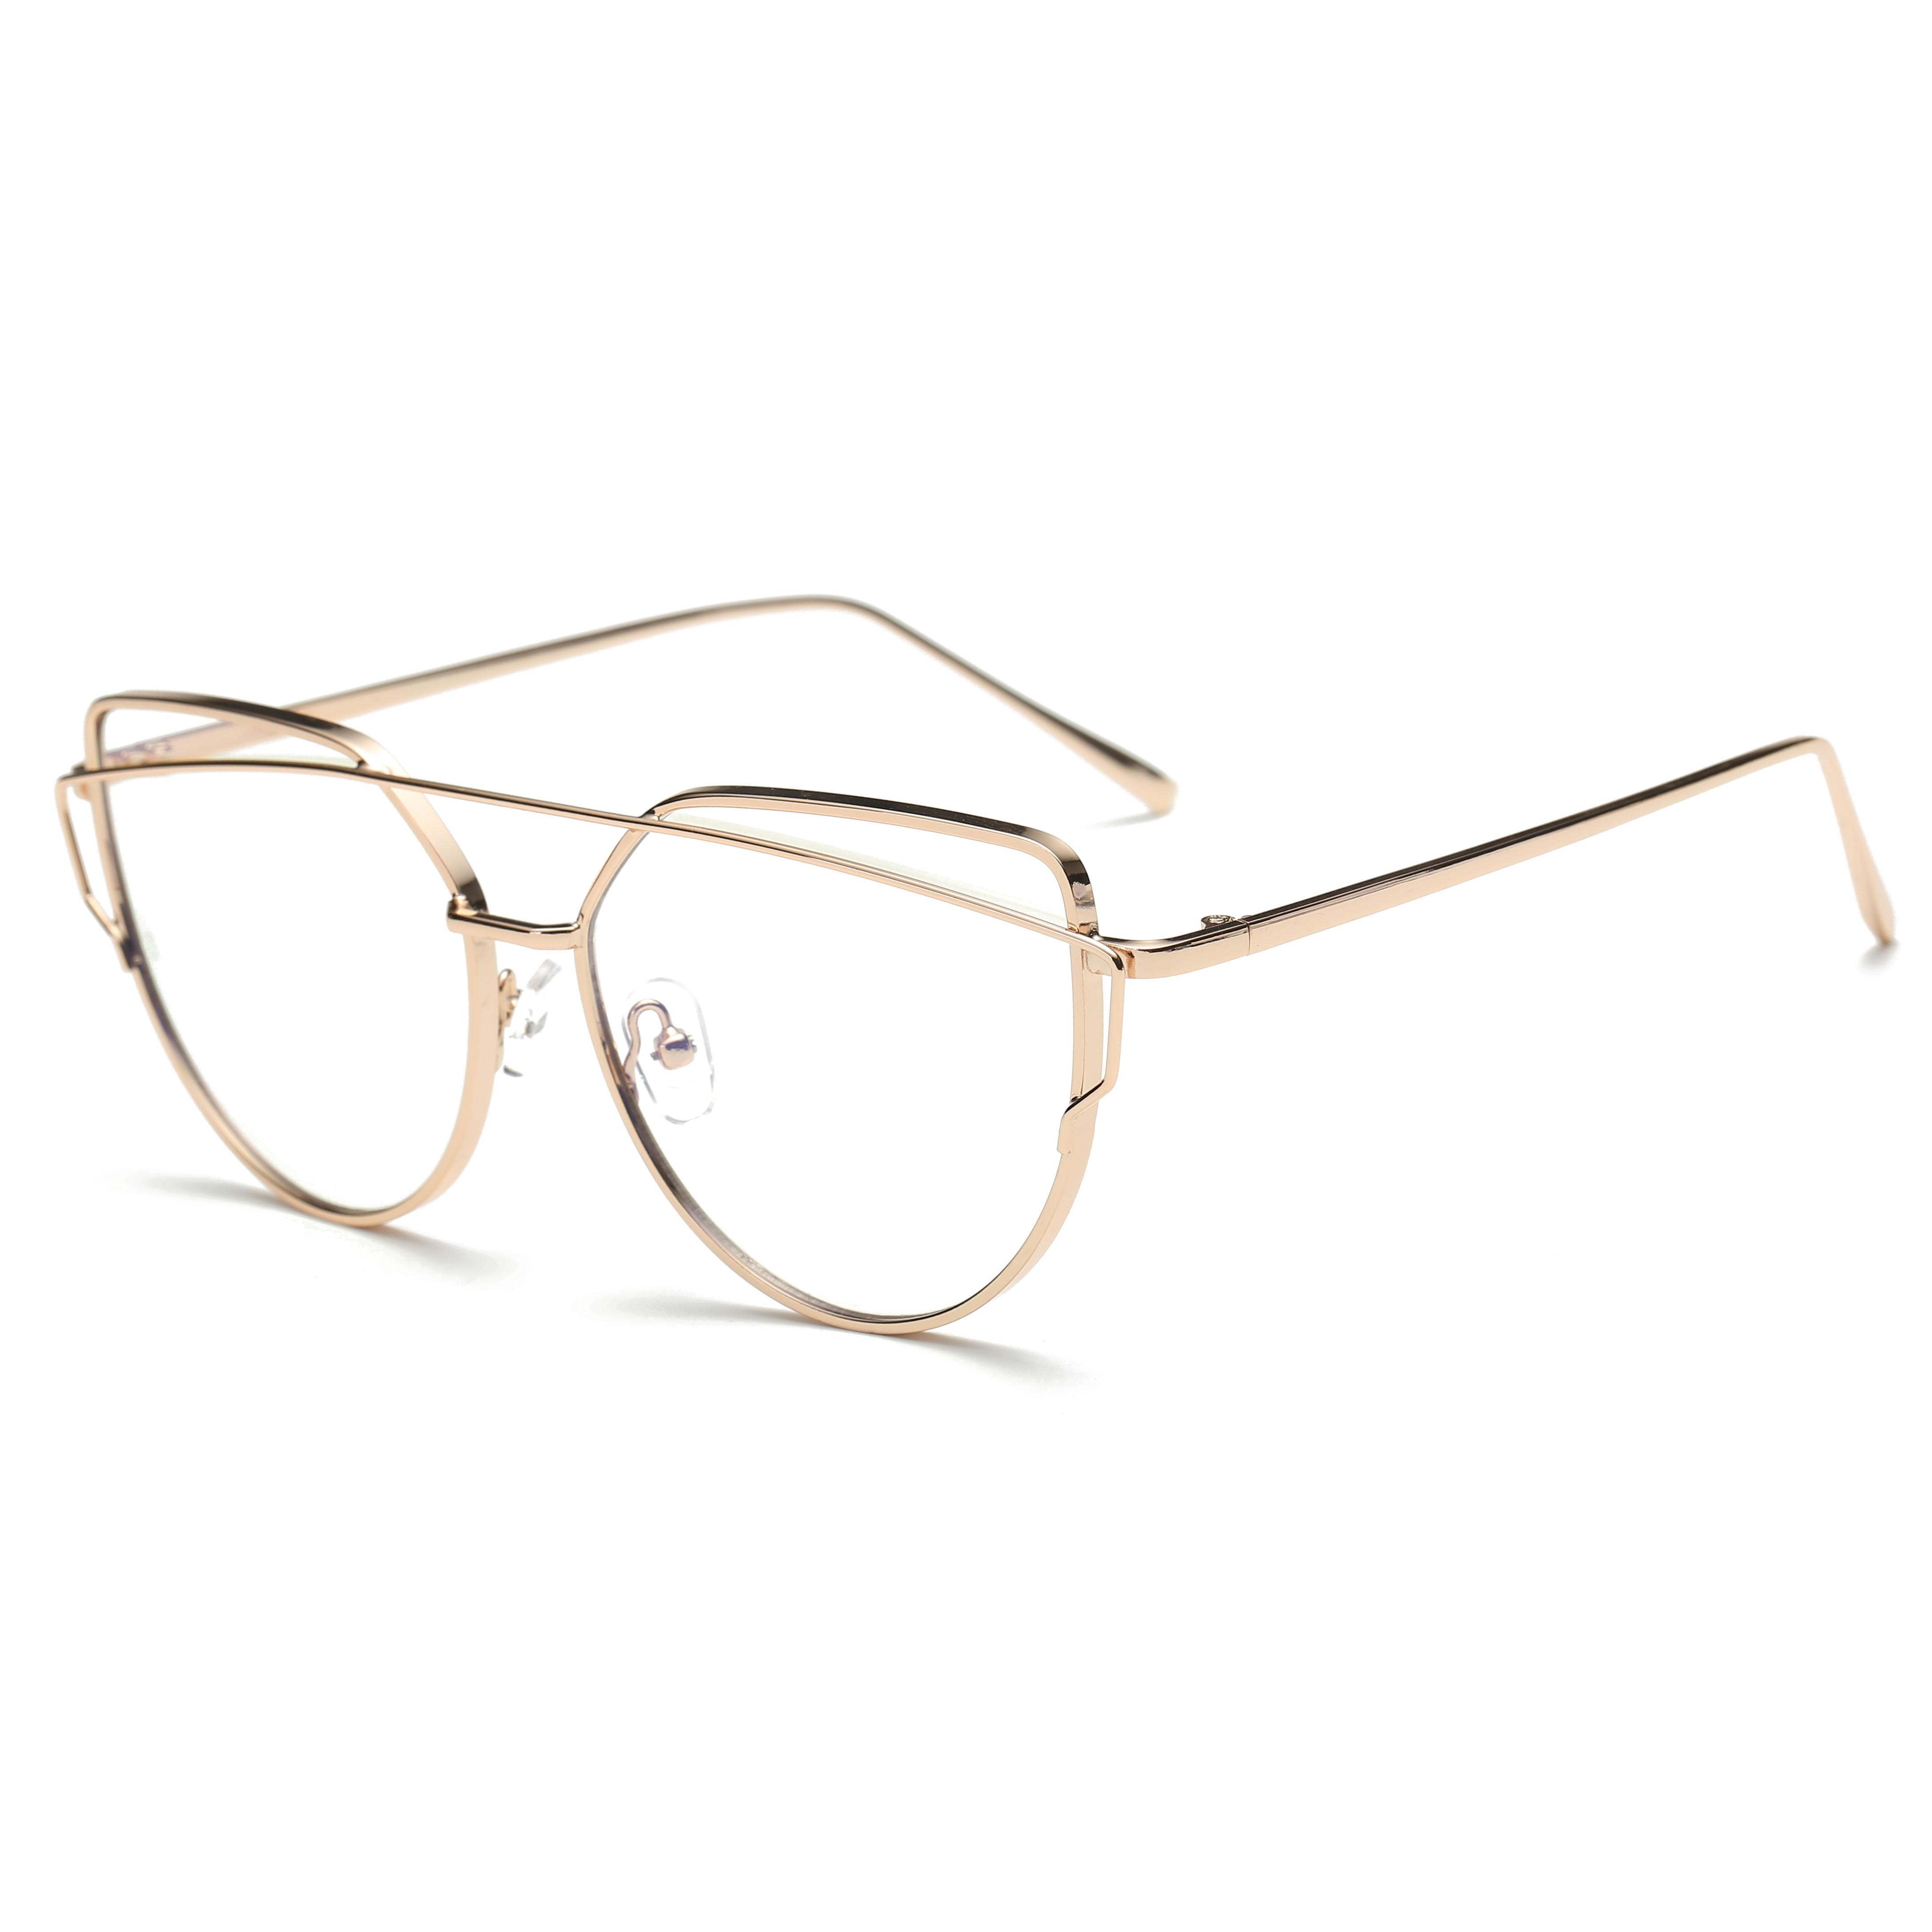 trendy glasses frames  Online Get Cheap Trendy Glasses Frames -Aliexpress.com